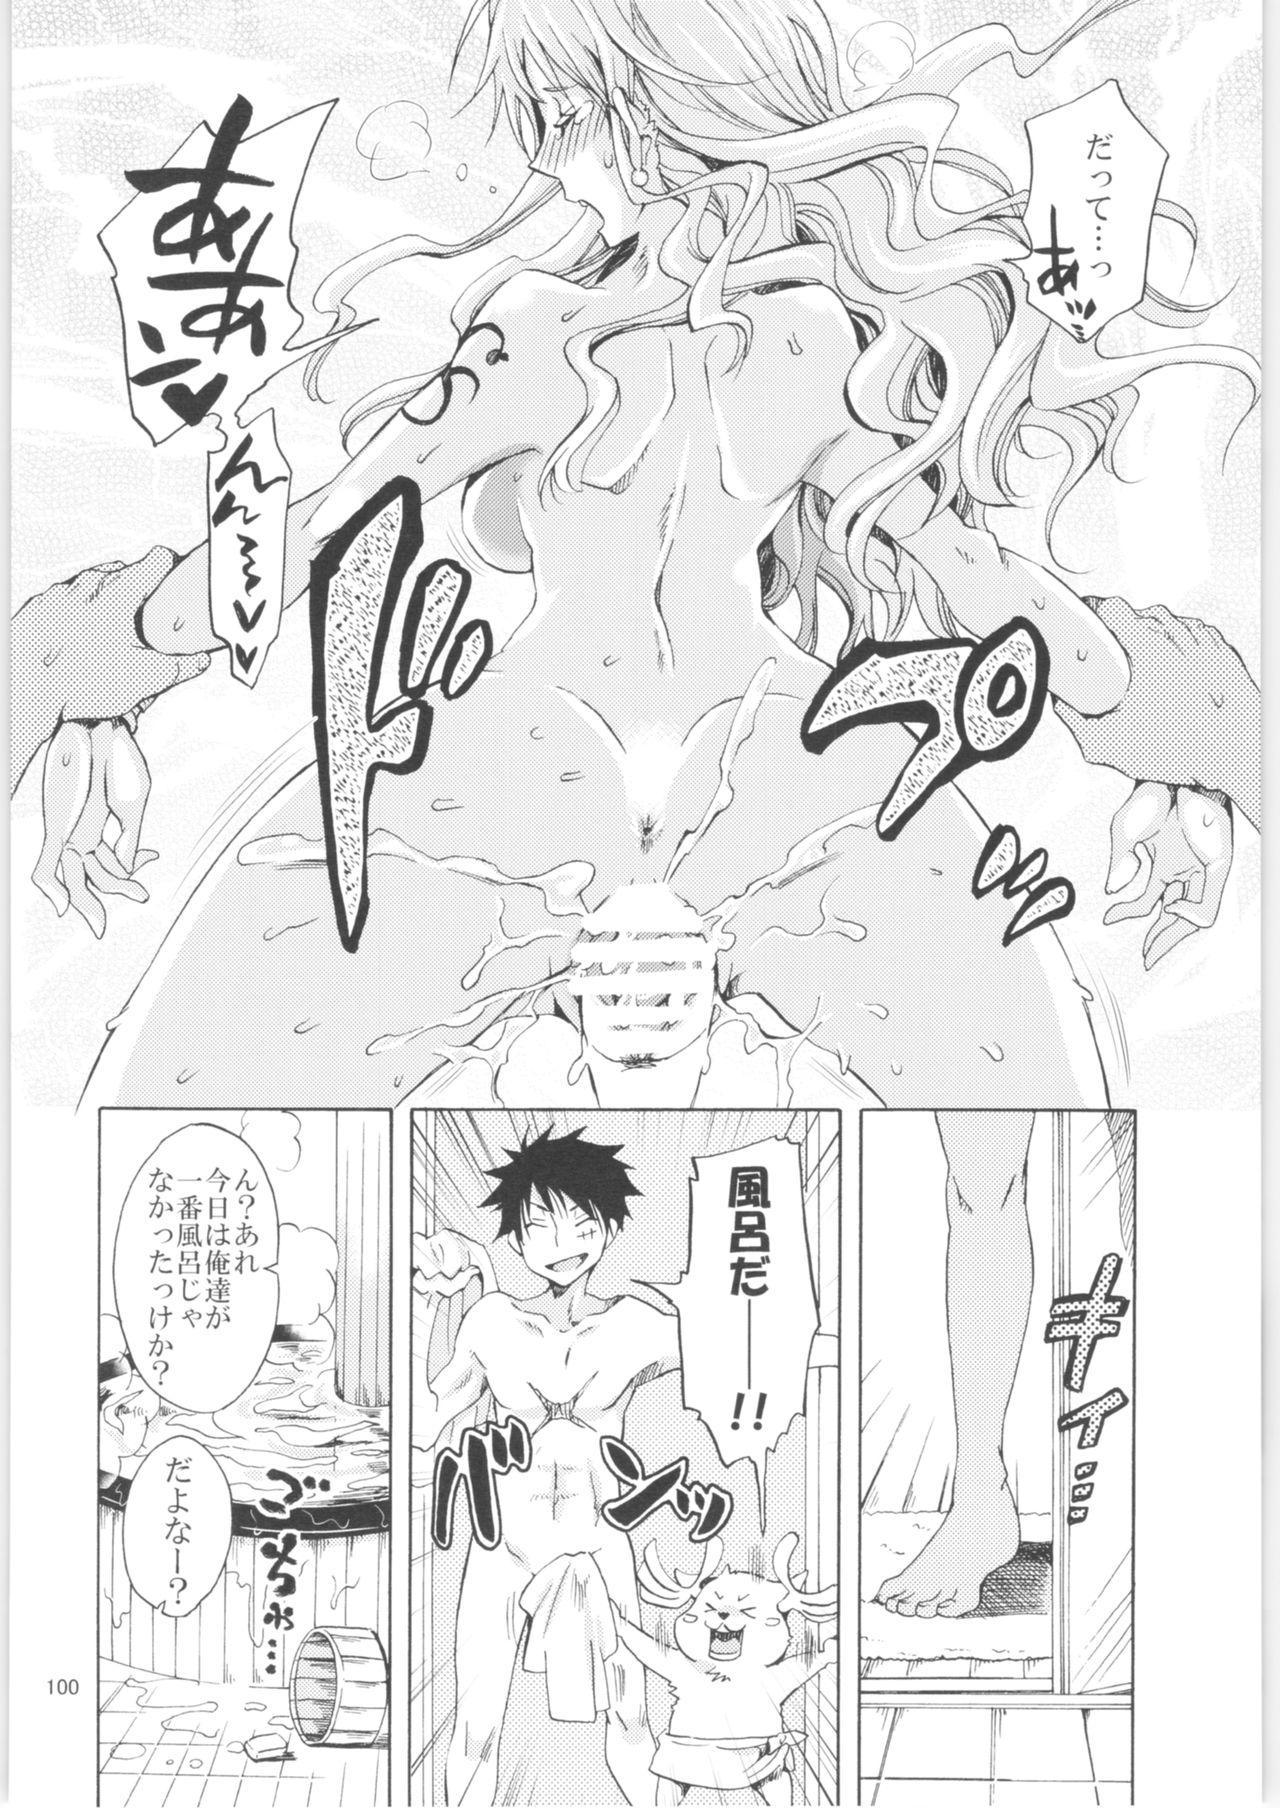 Kurione-sha Yorozu Soushuuhen 2 95